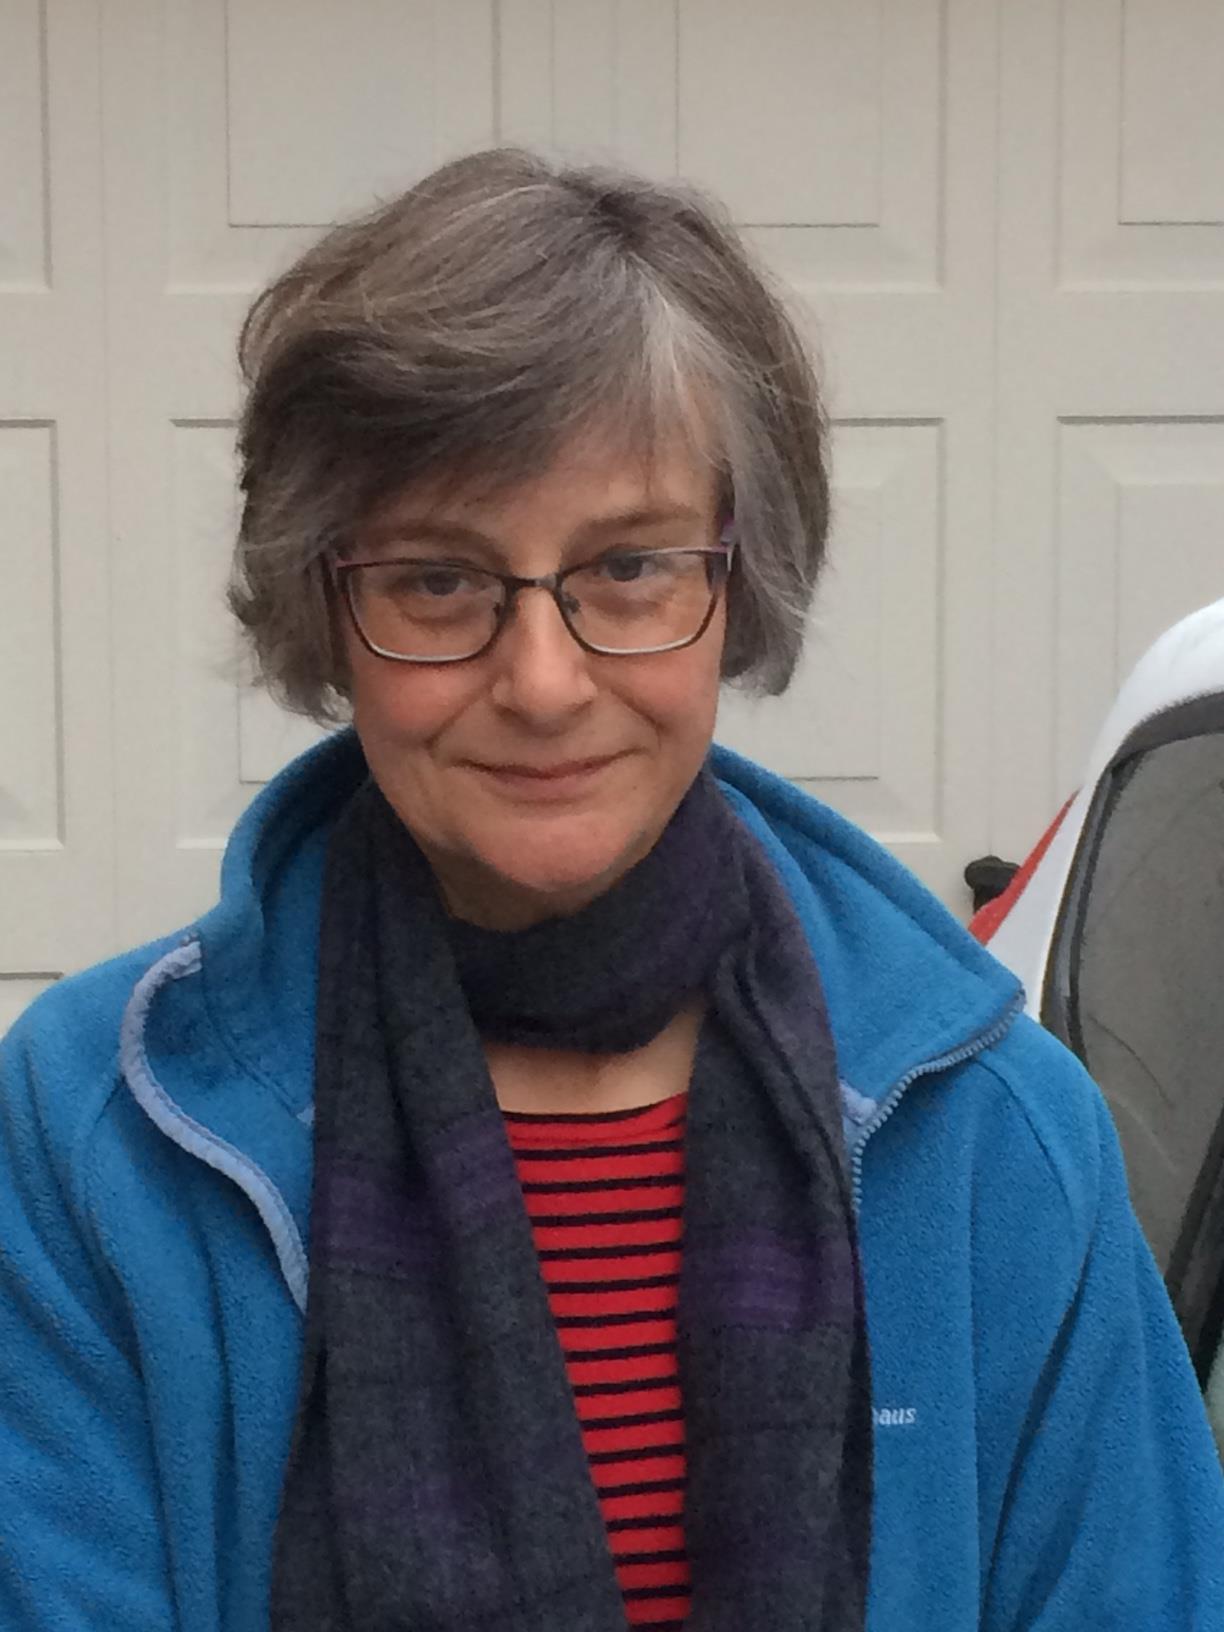 Alison Eagles